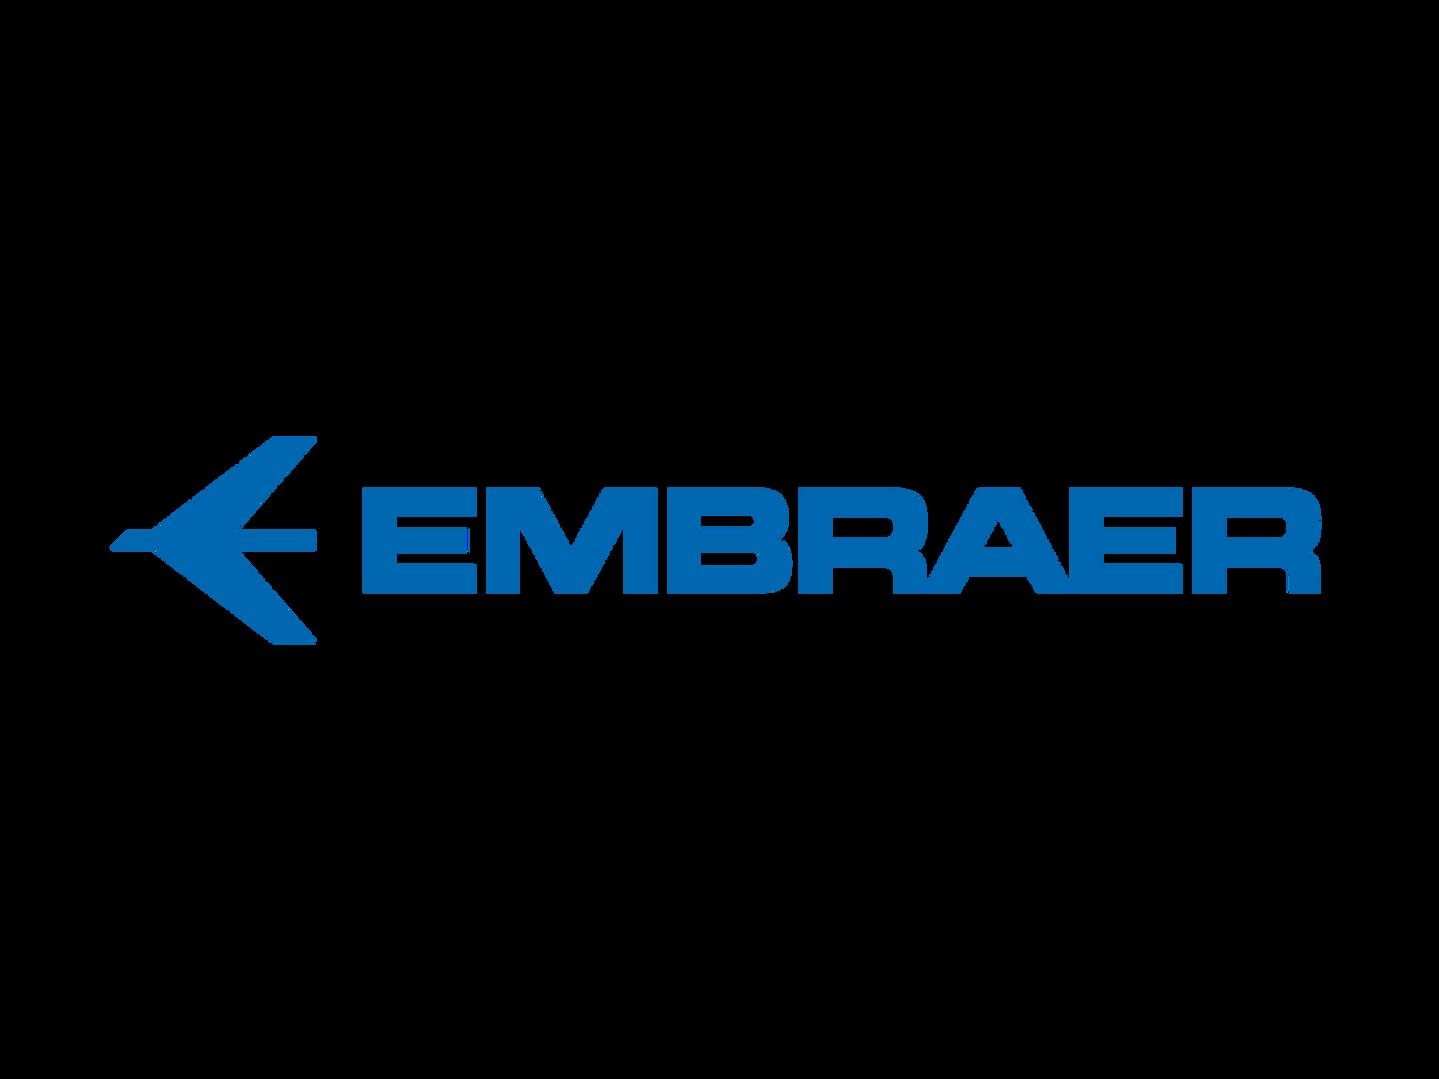 Embraer-logo-and-wordmark.png